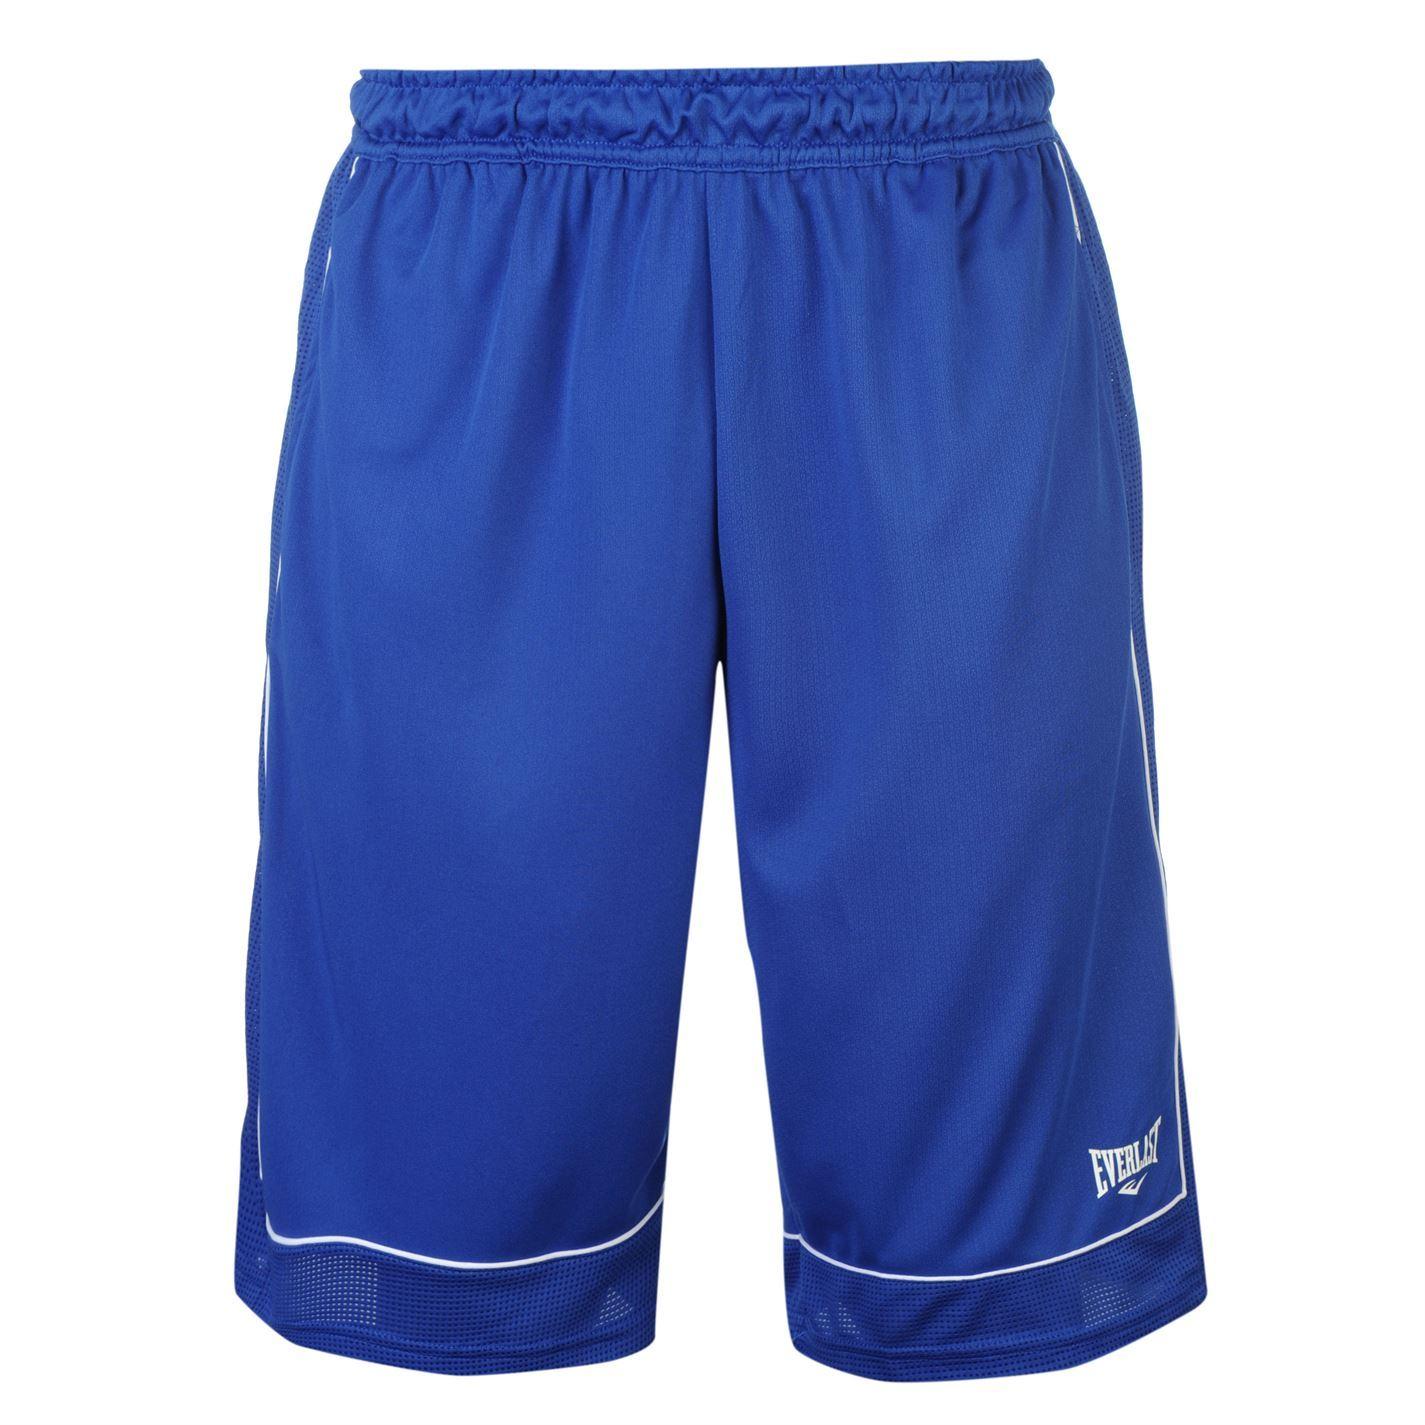 Everlast Basketball Shorts Mens Blue White Sportswear Short Ebay